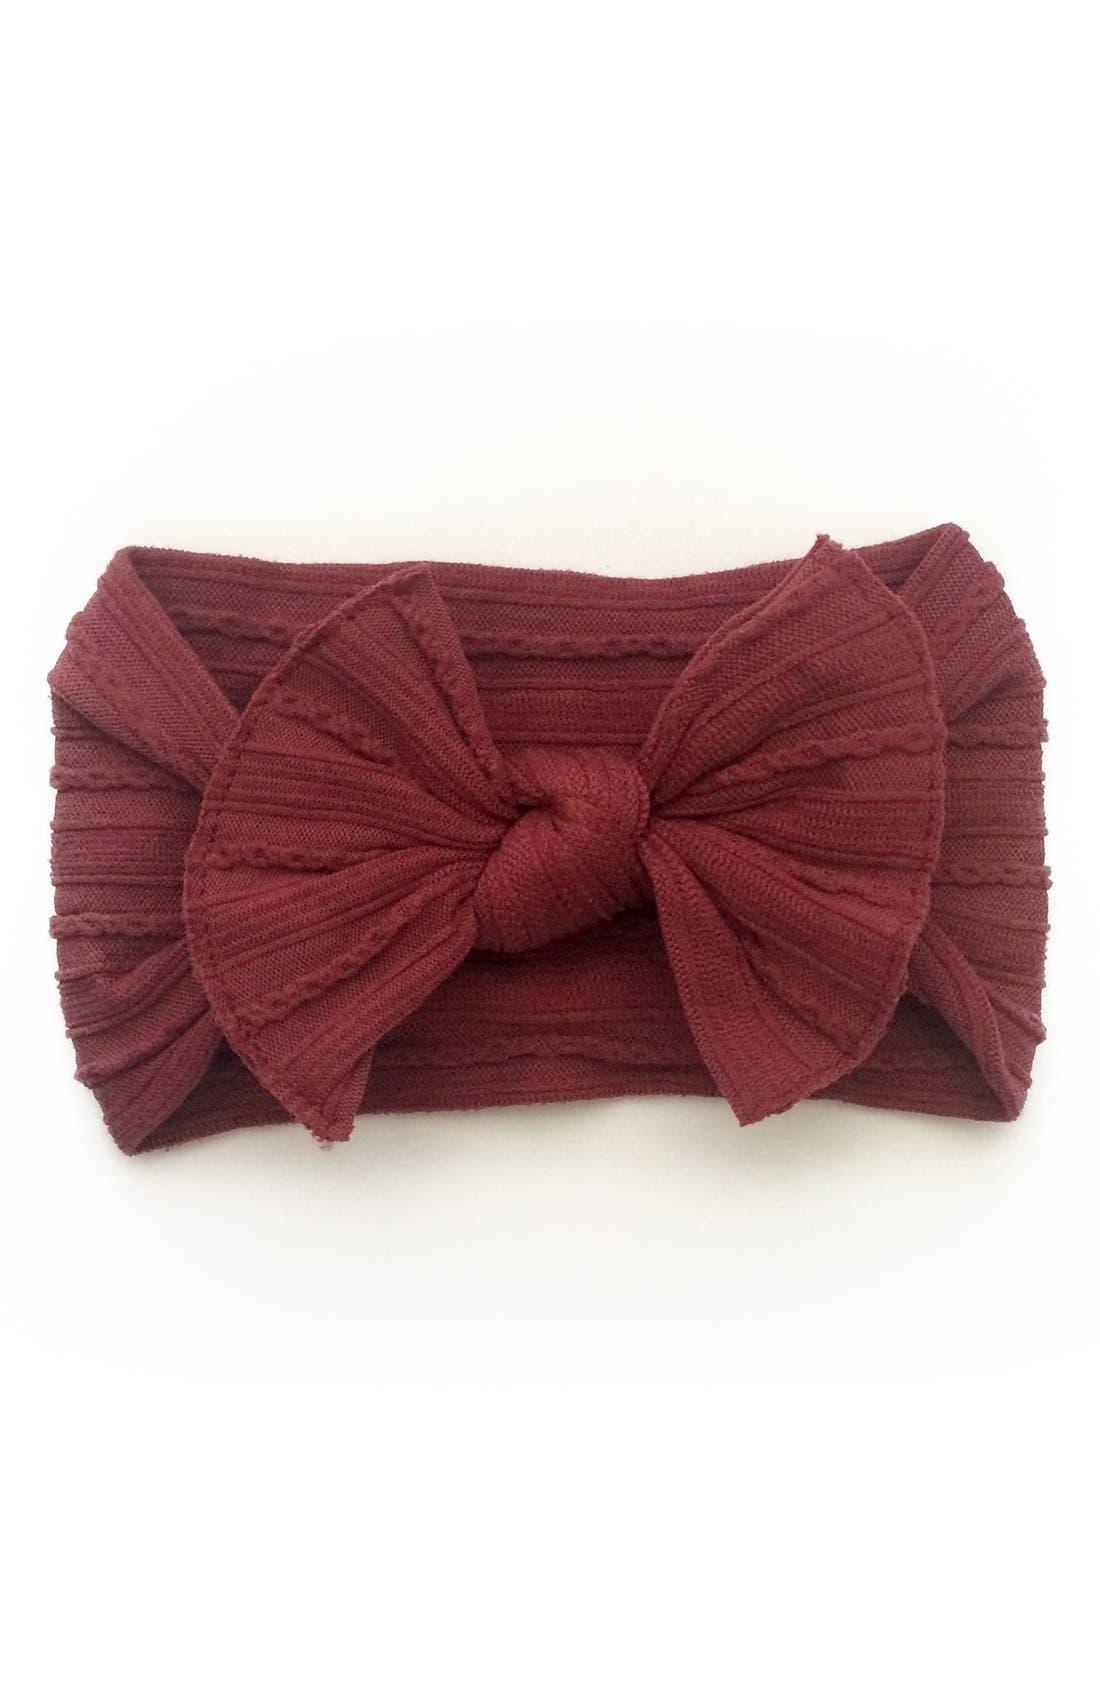 Bow Headband,                             Main thumbnail 1, color,                             Burgundy